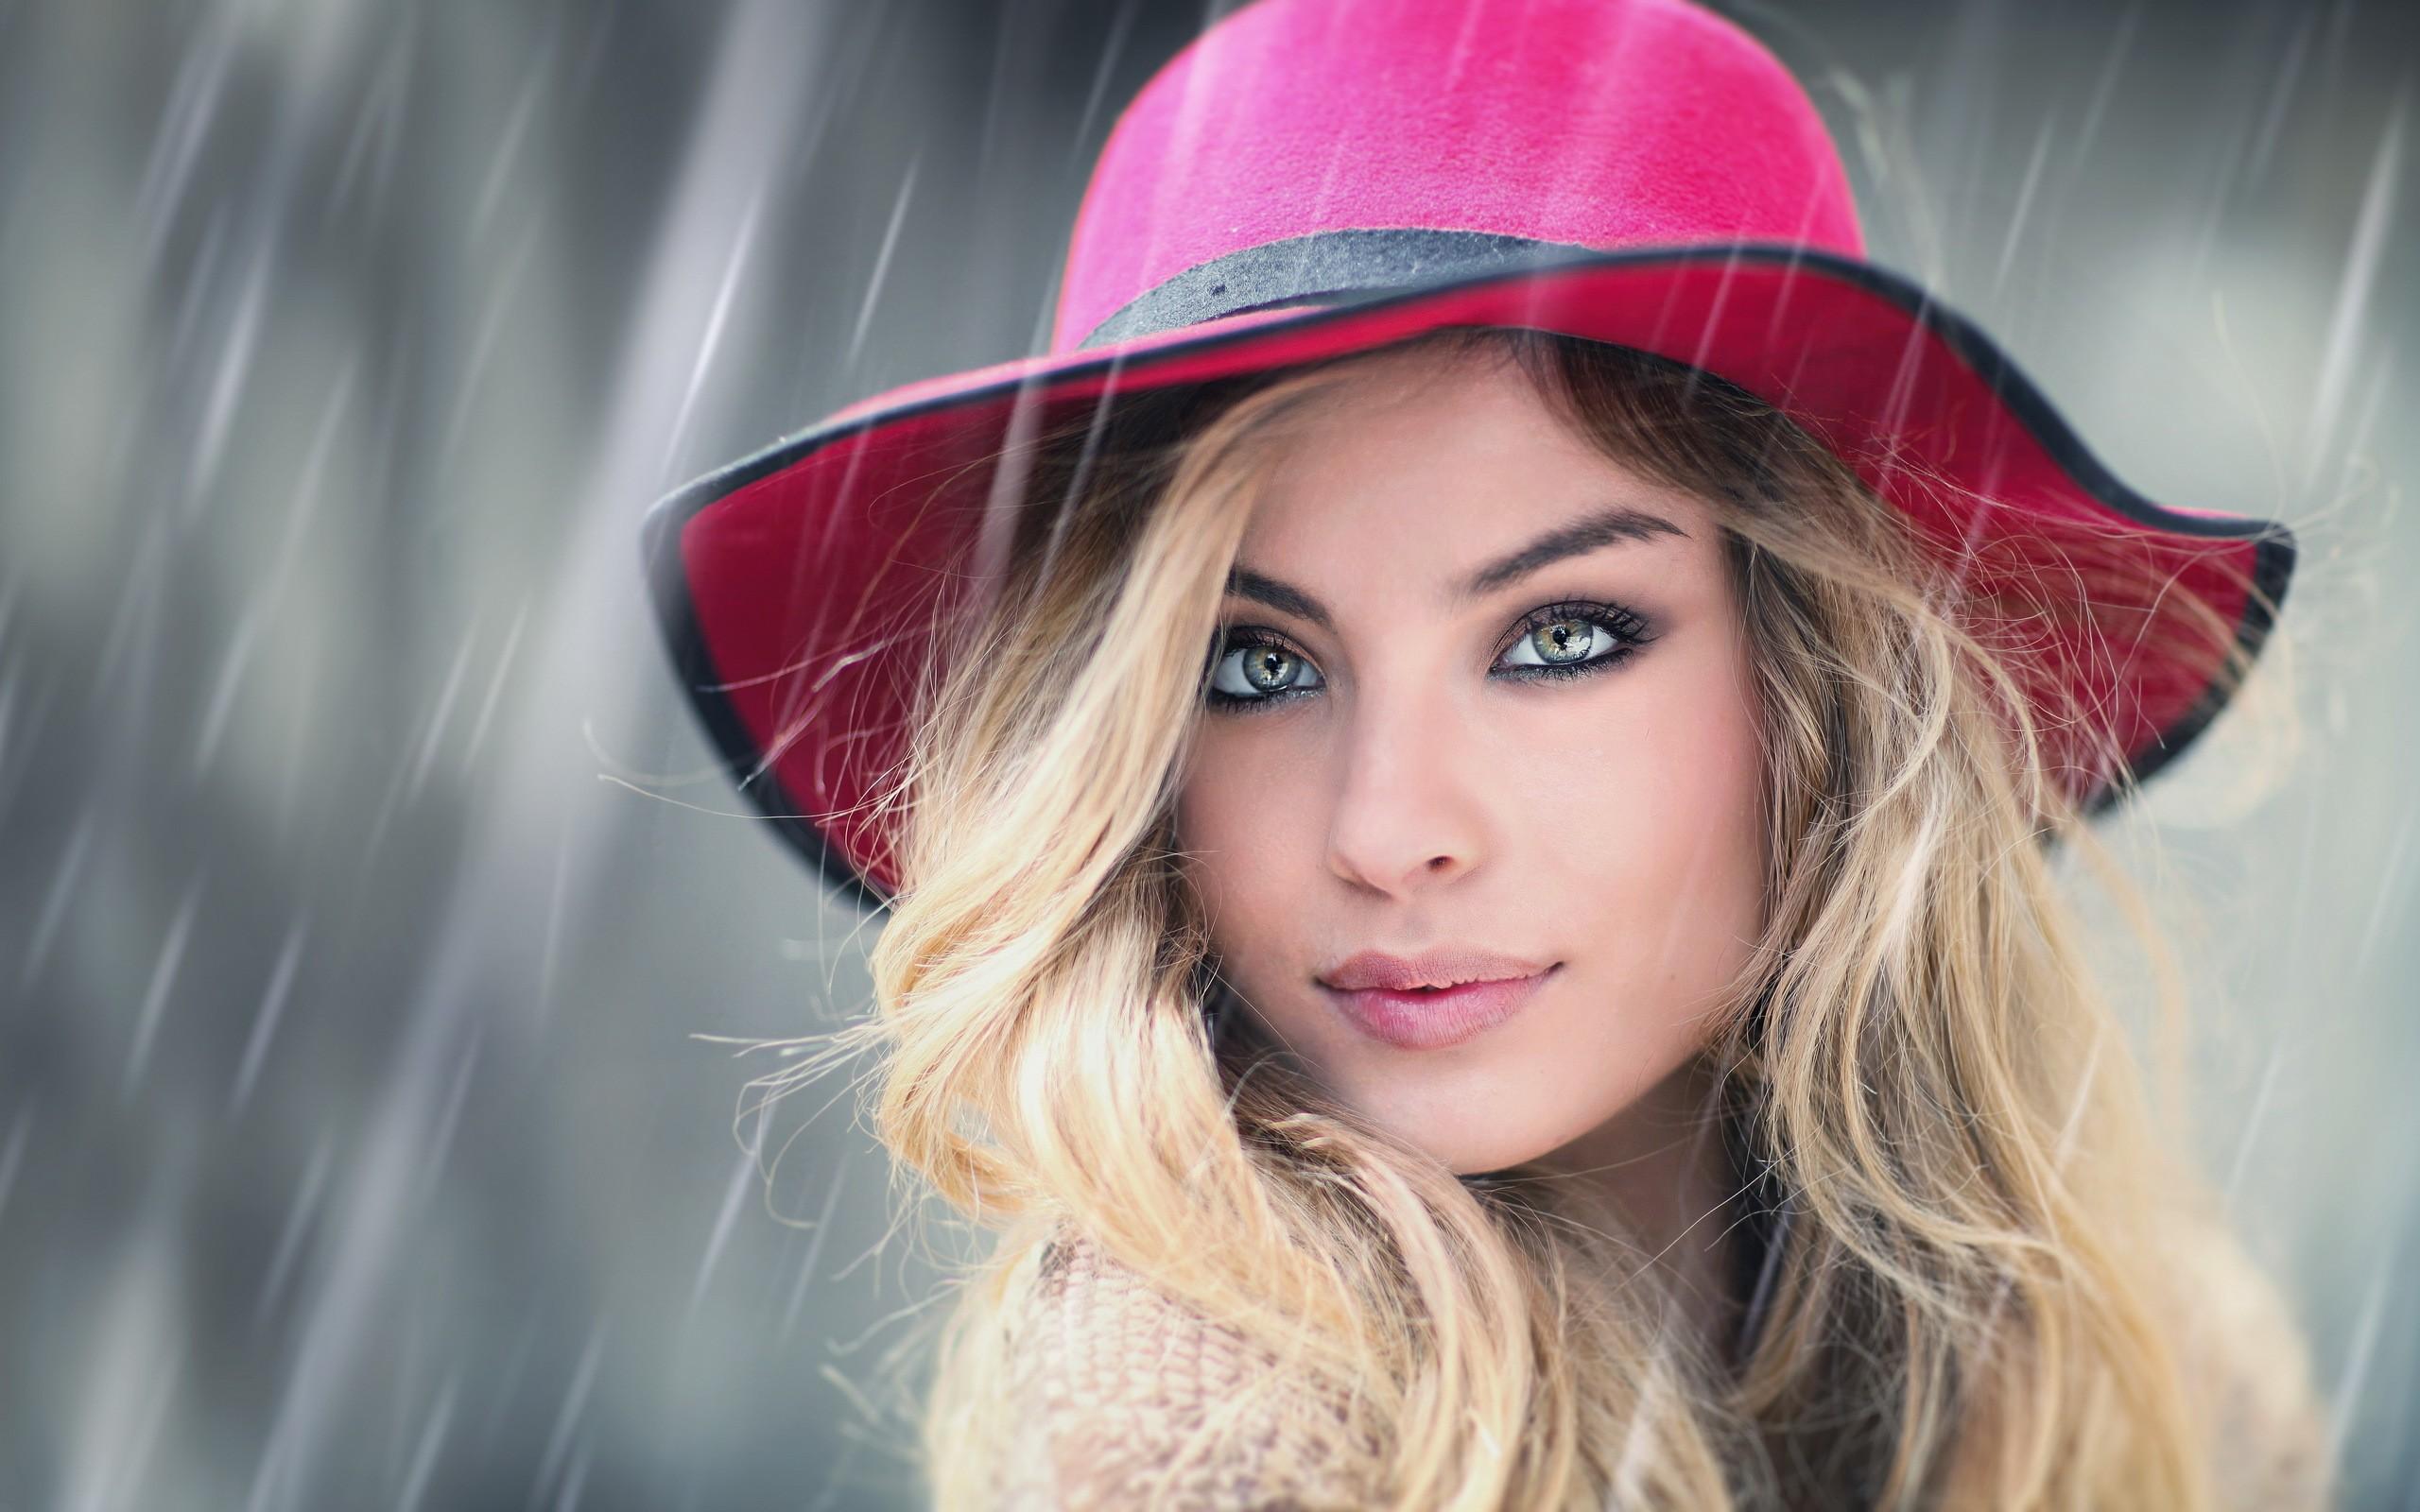 Women Hat Long Hair Blonde Rain Looking At Viewer